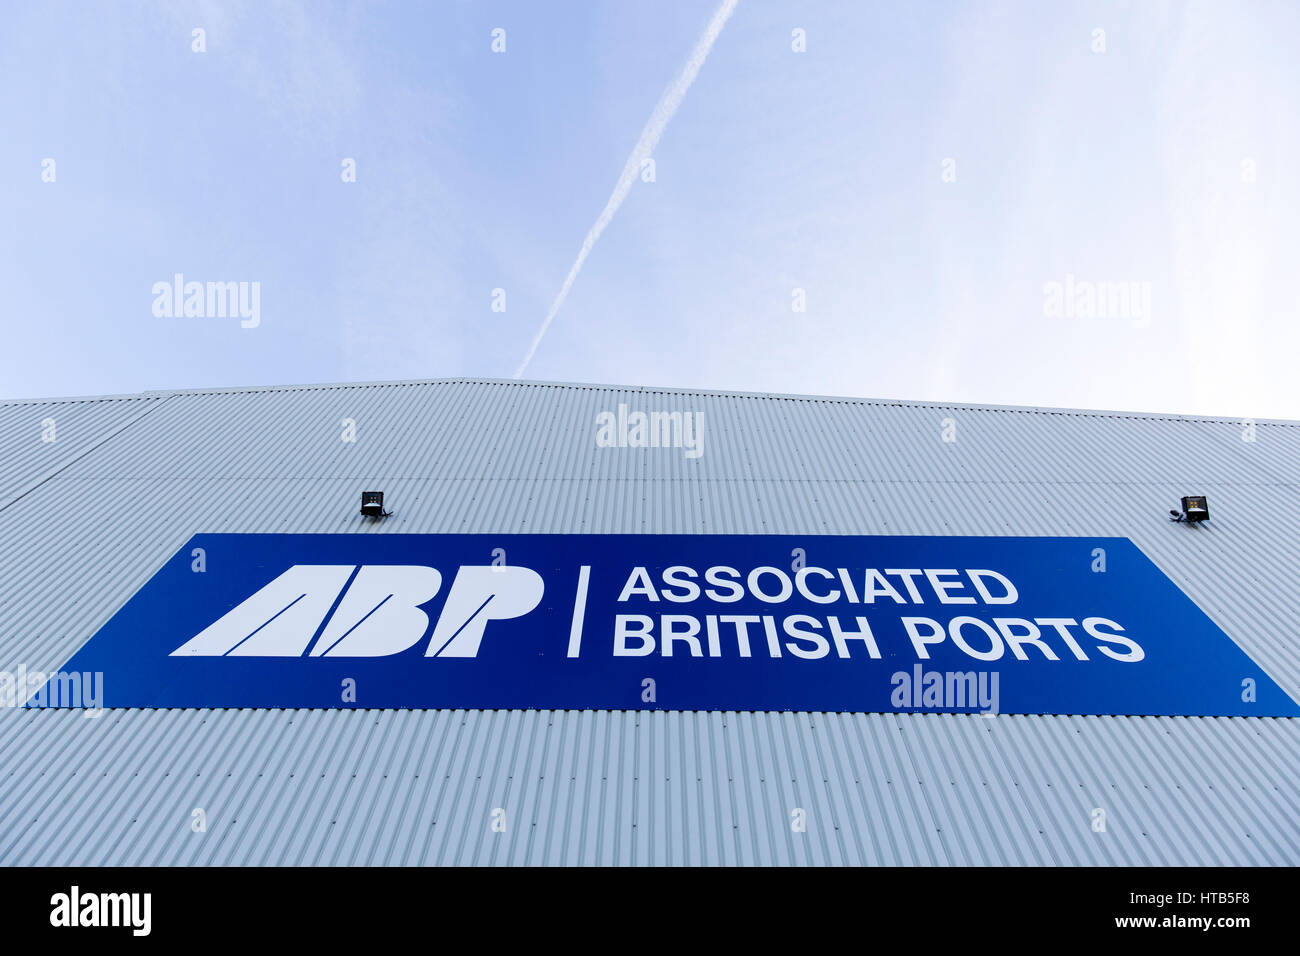 Associated British Ports signage at The Port of Garston. - Stock Image